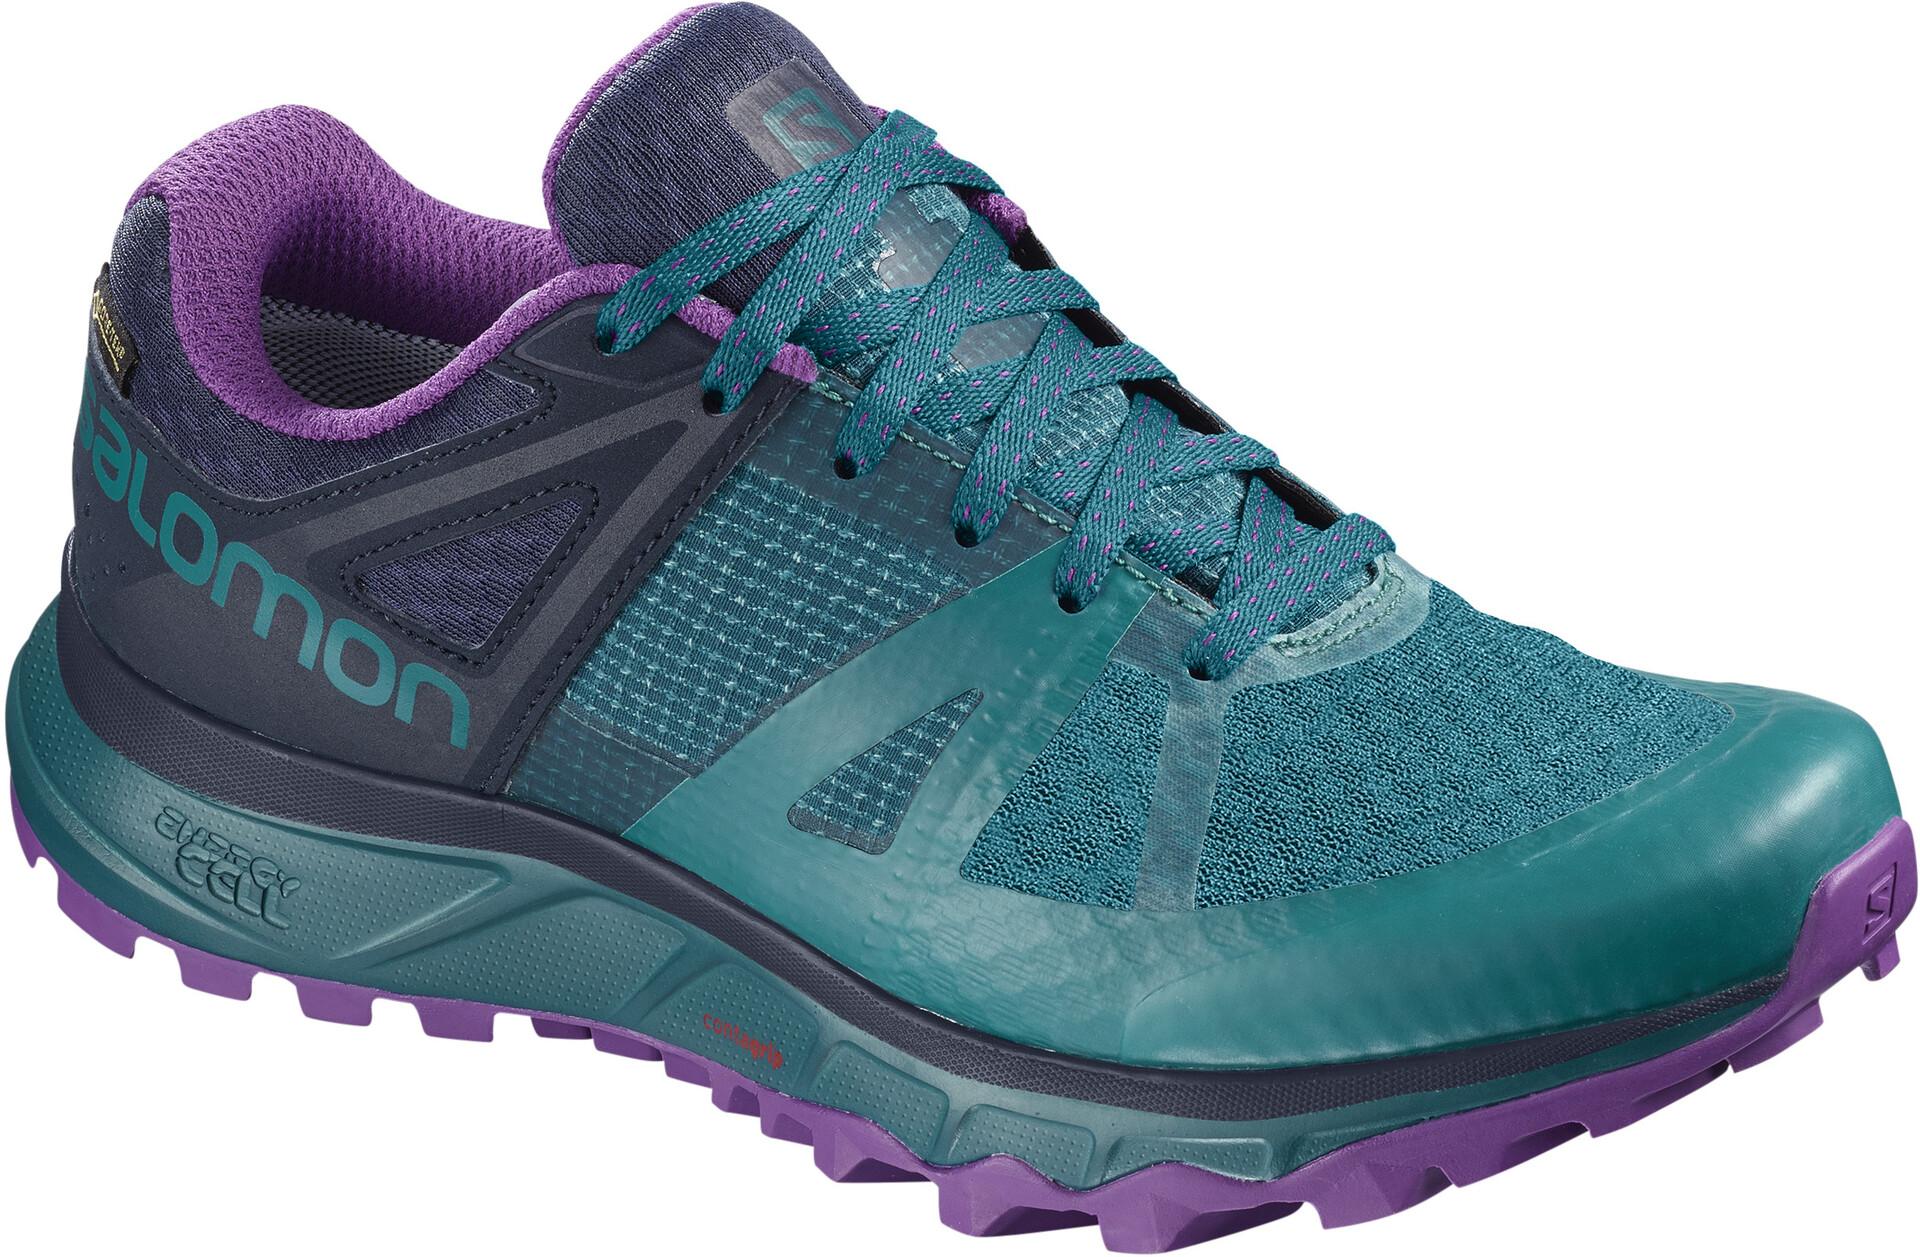 Salomon Trailster GTX Shoes Damen deep lagoonnavy blazerpurple magic